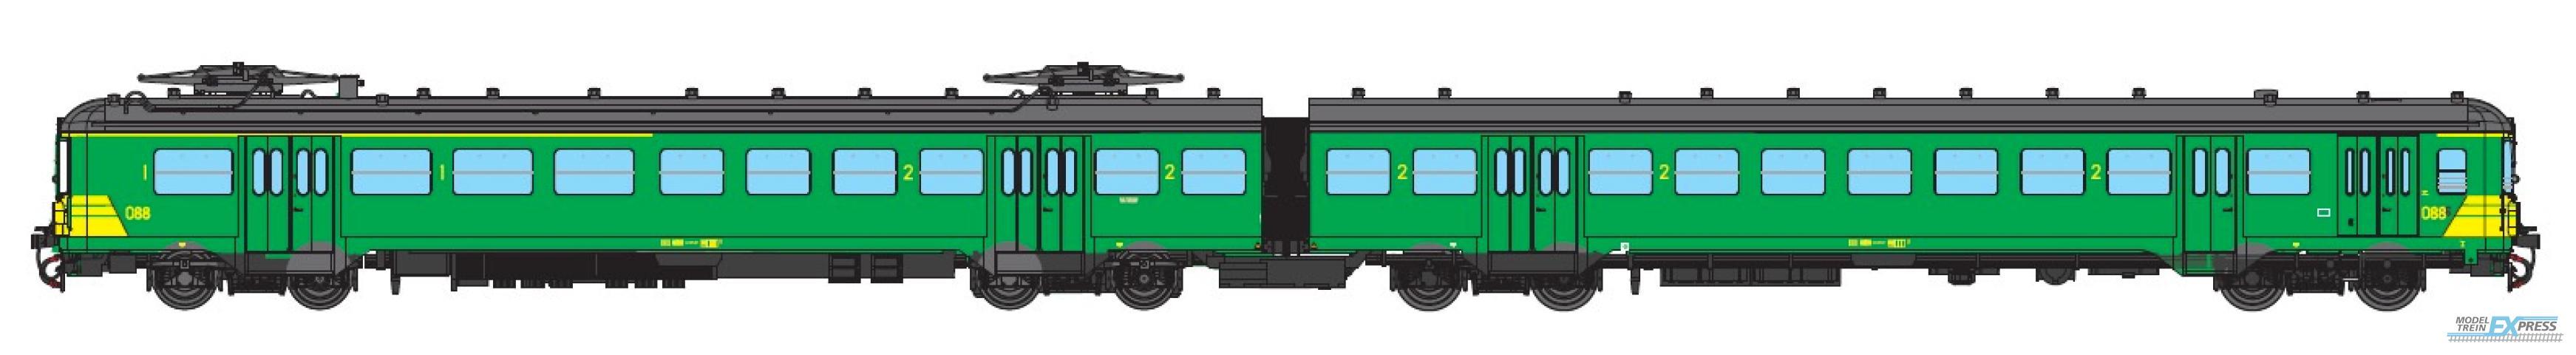 B-Models 7003.03L